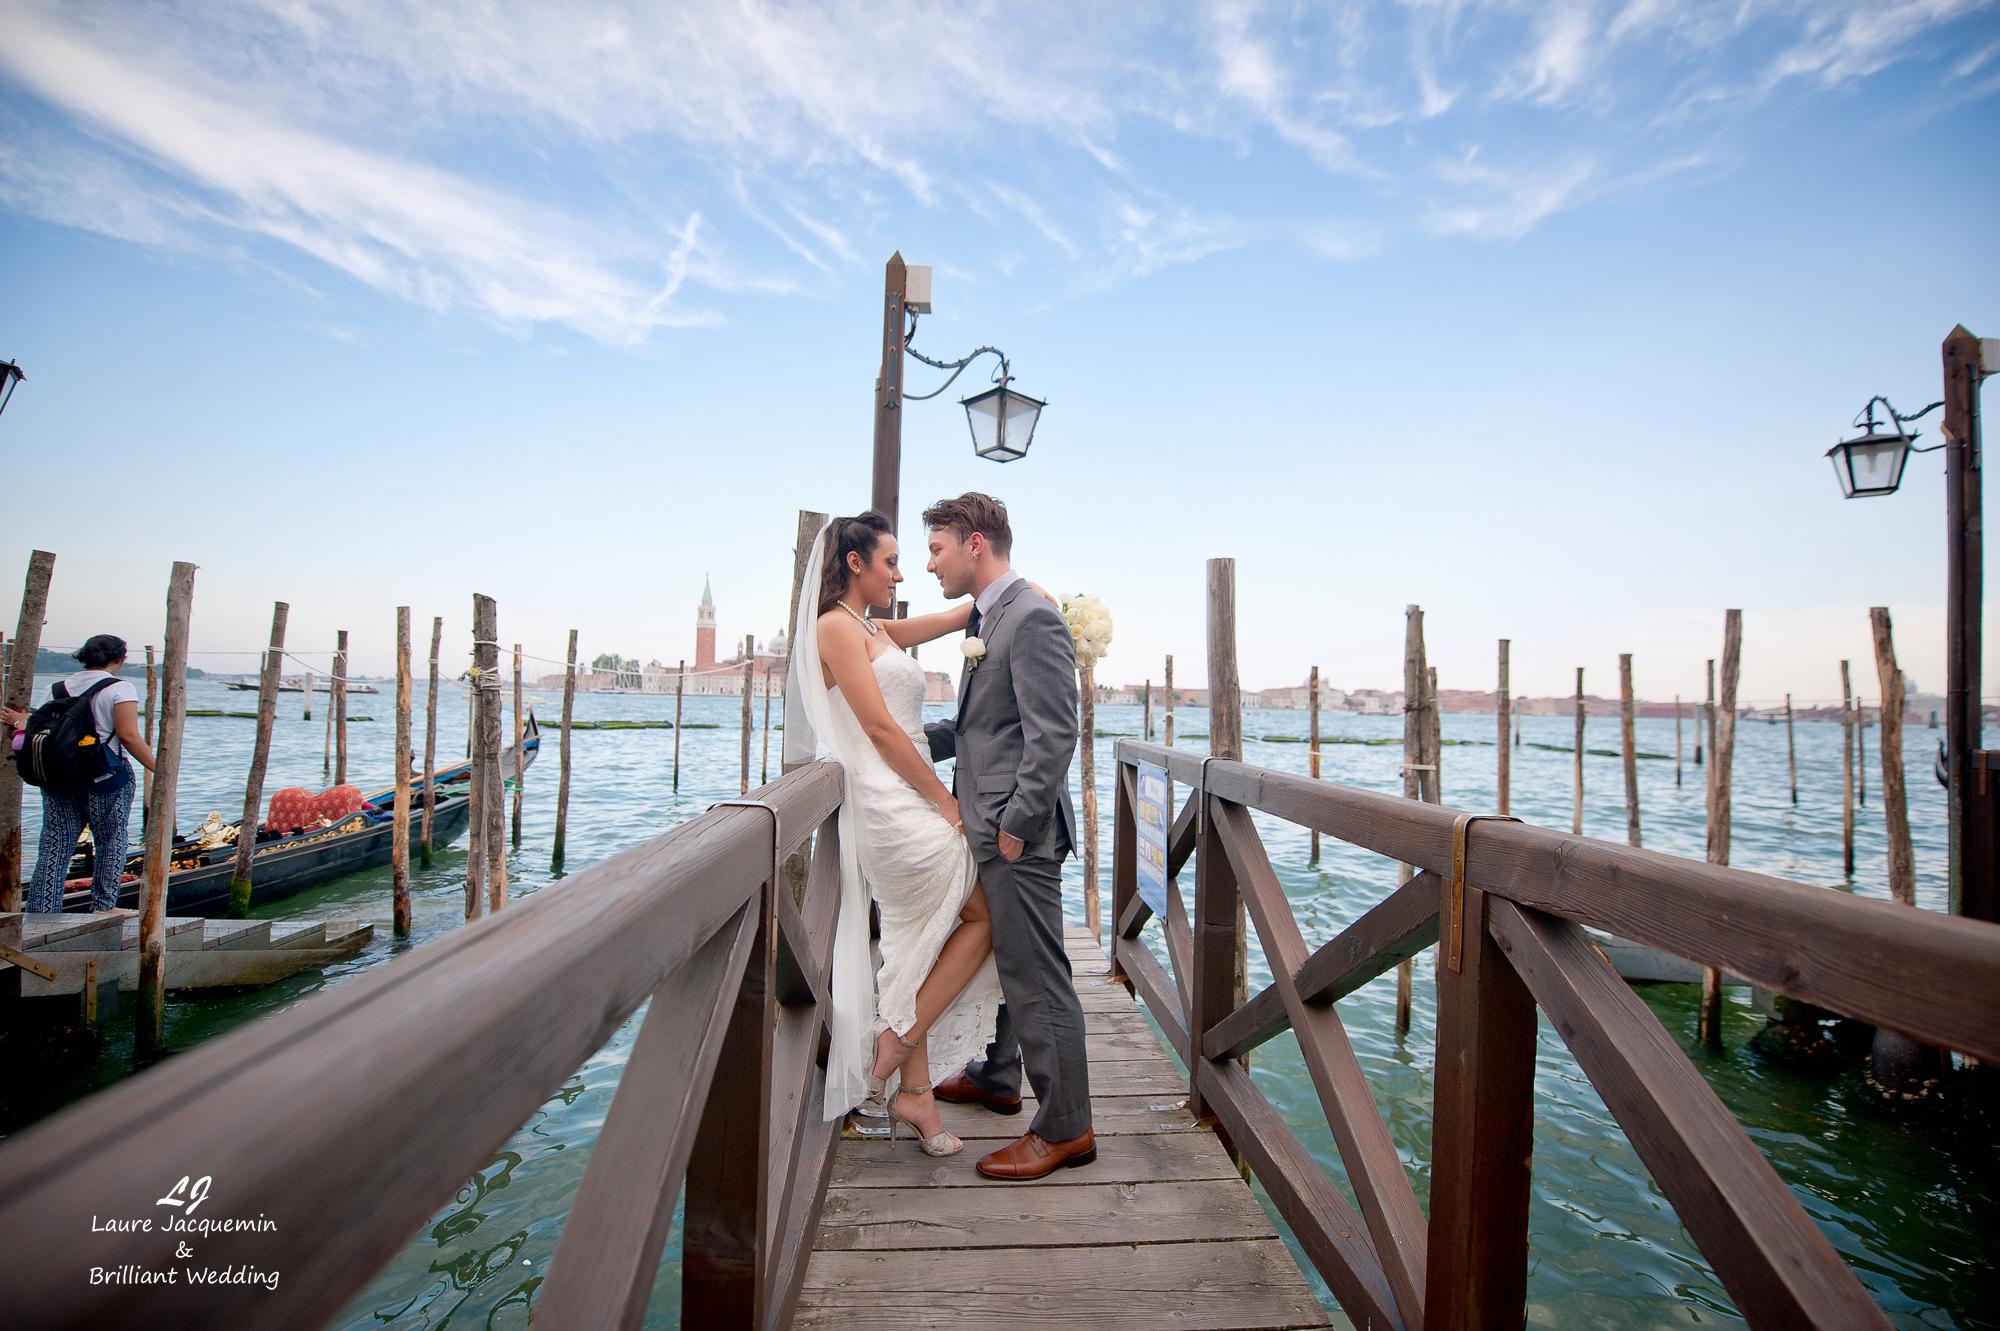 Venice Simbolic Wedding gondola venice Italy laure jacquemin photography (81) copia